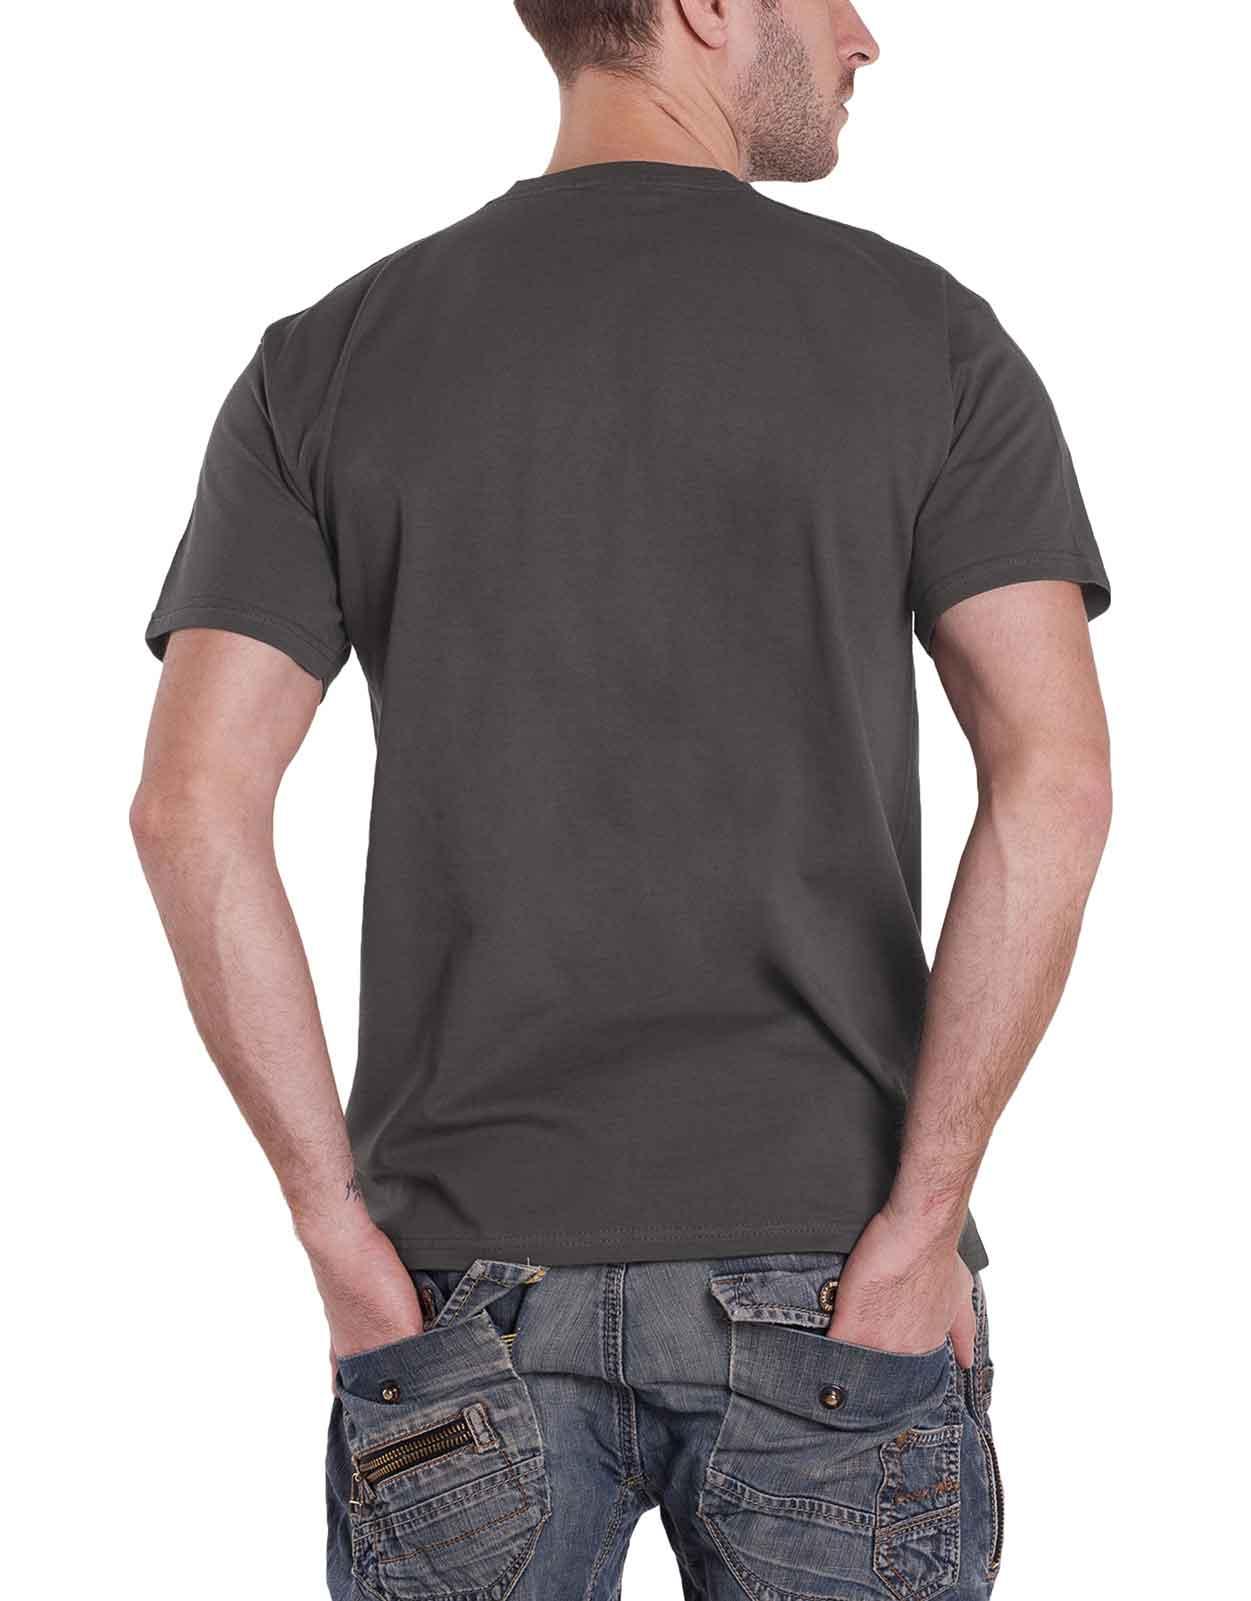 Officiel-The-Doors-T-Shirt-Jim-Morrison-poete-americain-Break-On-Through-Homme-NEUF miniature 33